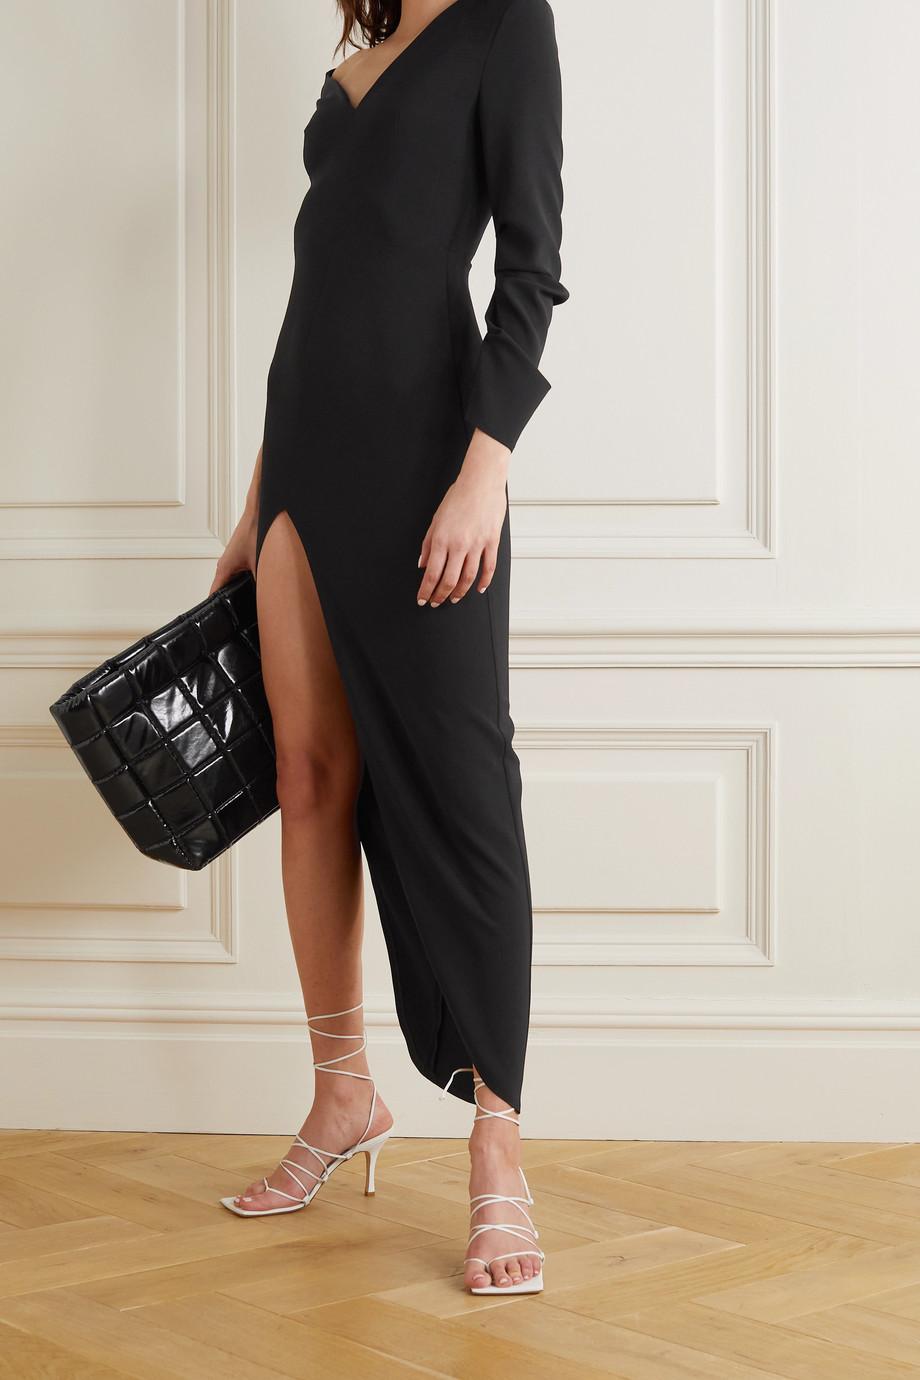 A.W.A.K.E. MODE Kleid aus Crêpe mit asymmetrischer Schulterpartie